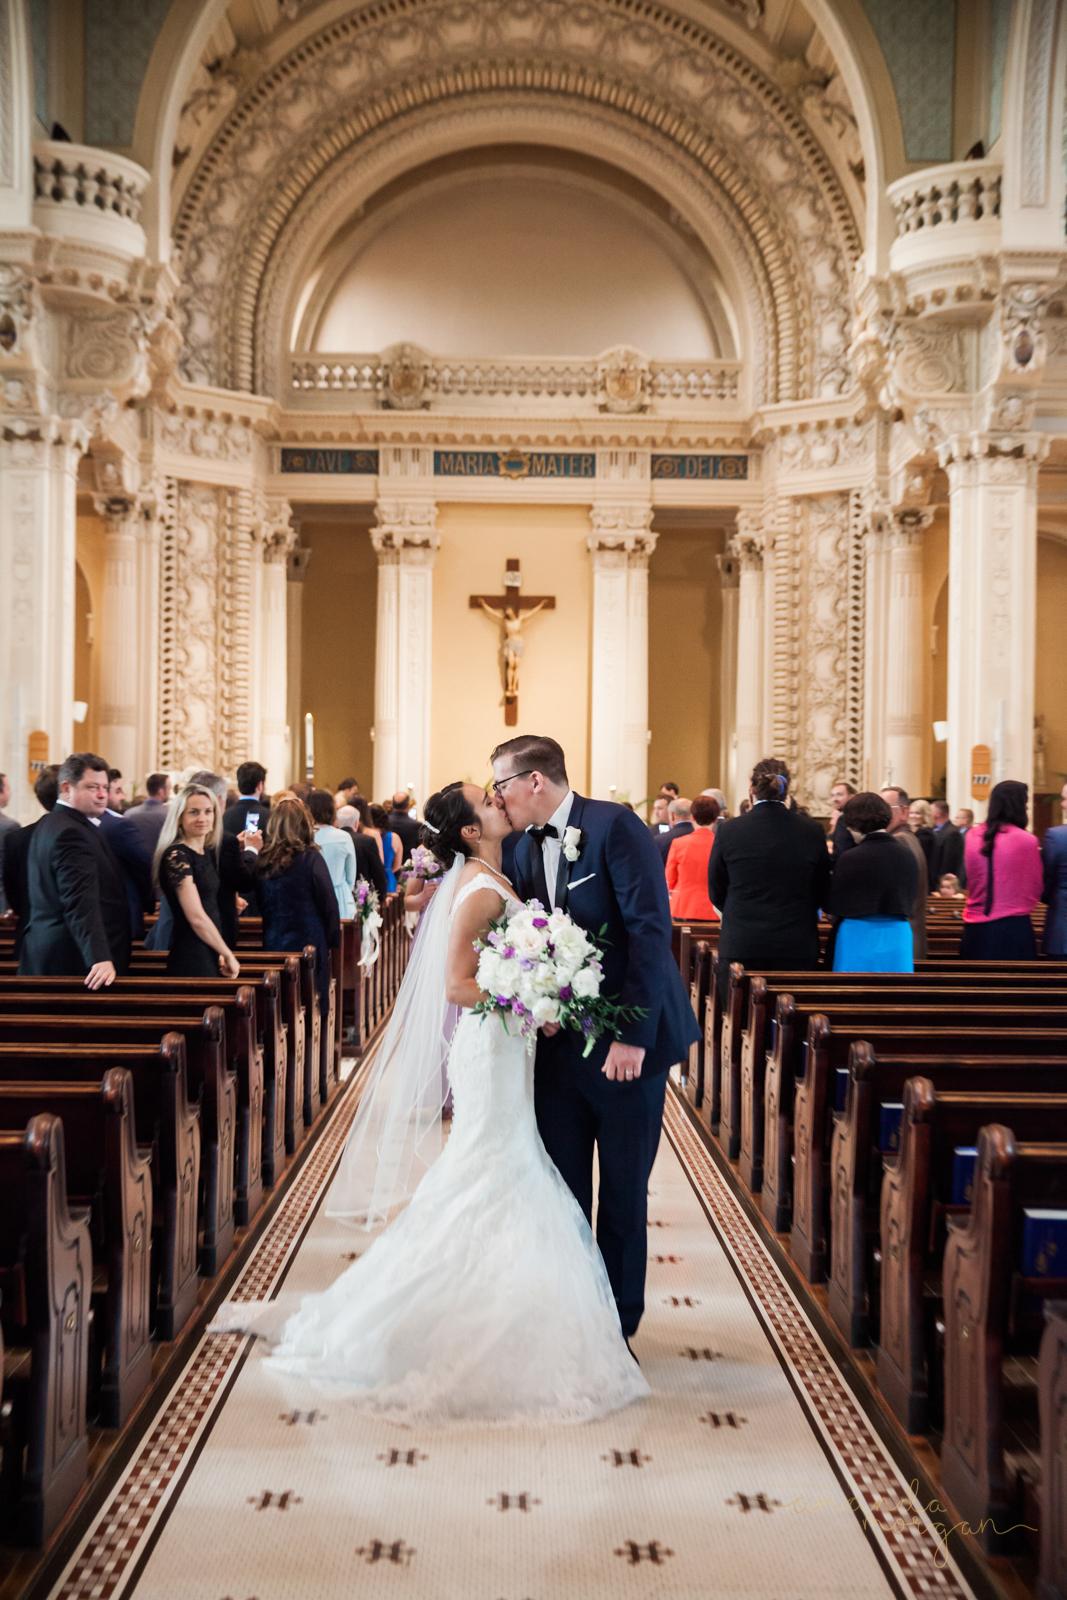 Notre-Dame-Catholic-Church-Wedding-Amanda-Morgan-9.jpg